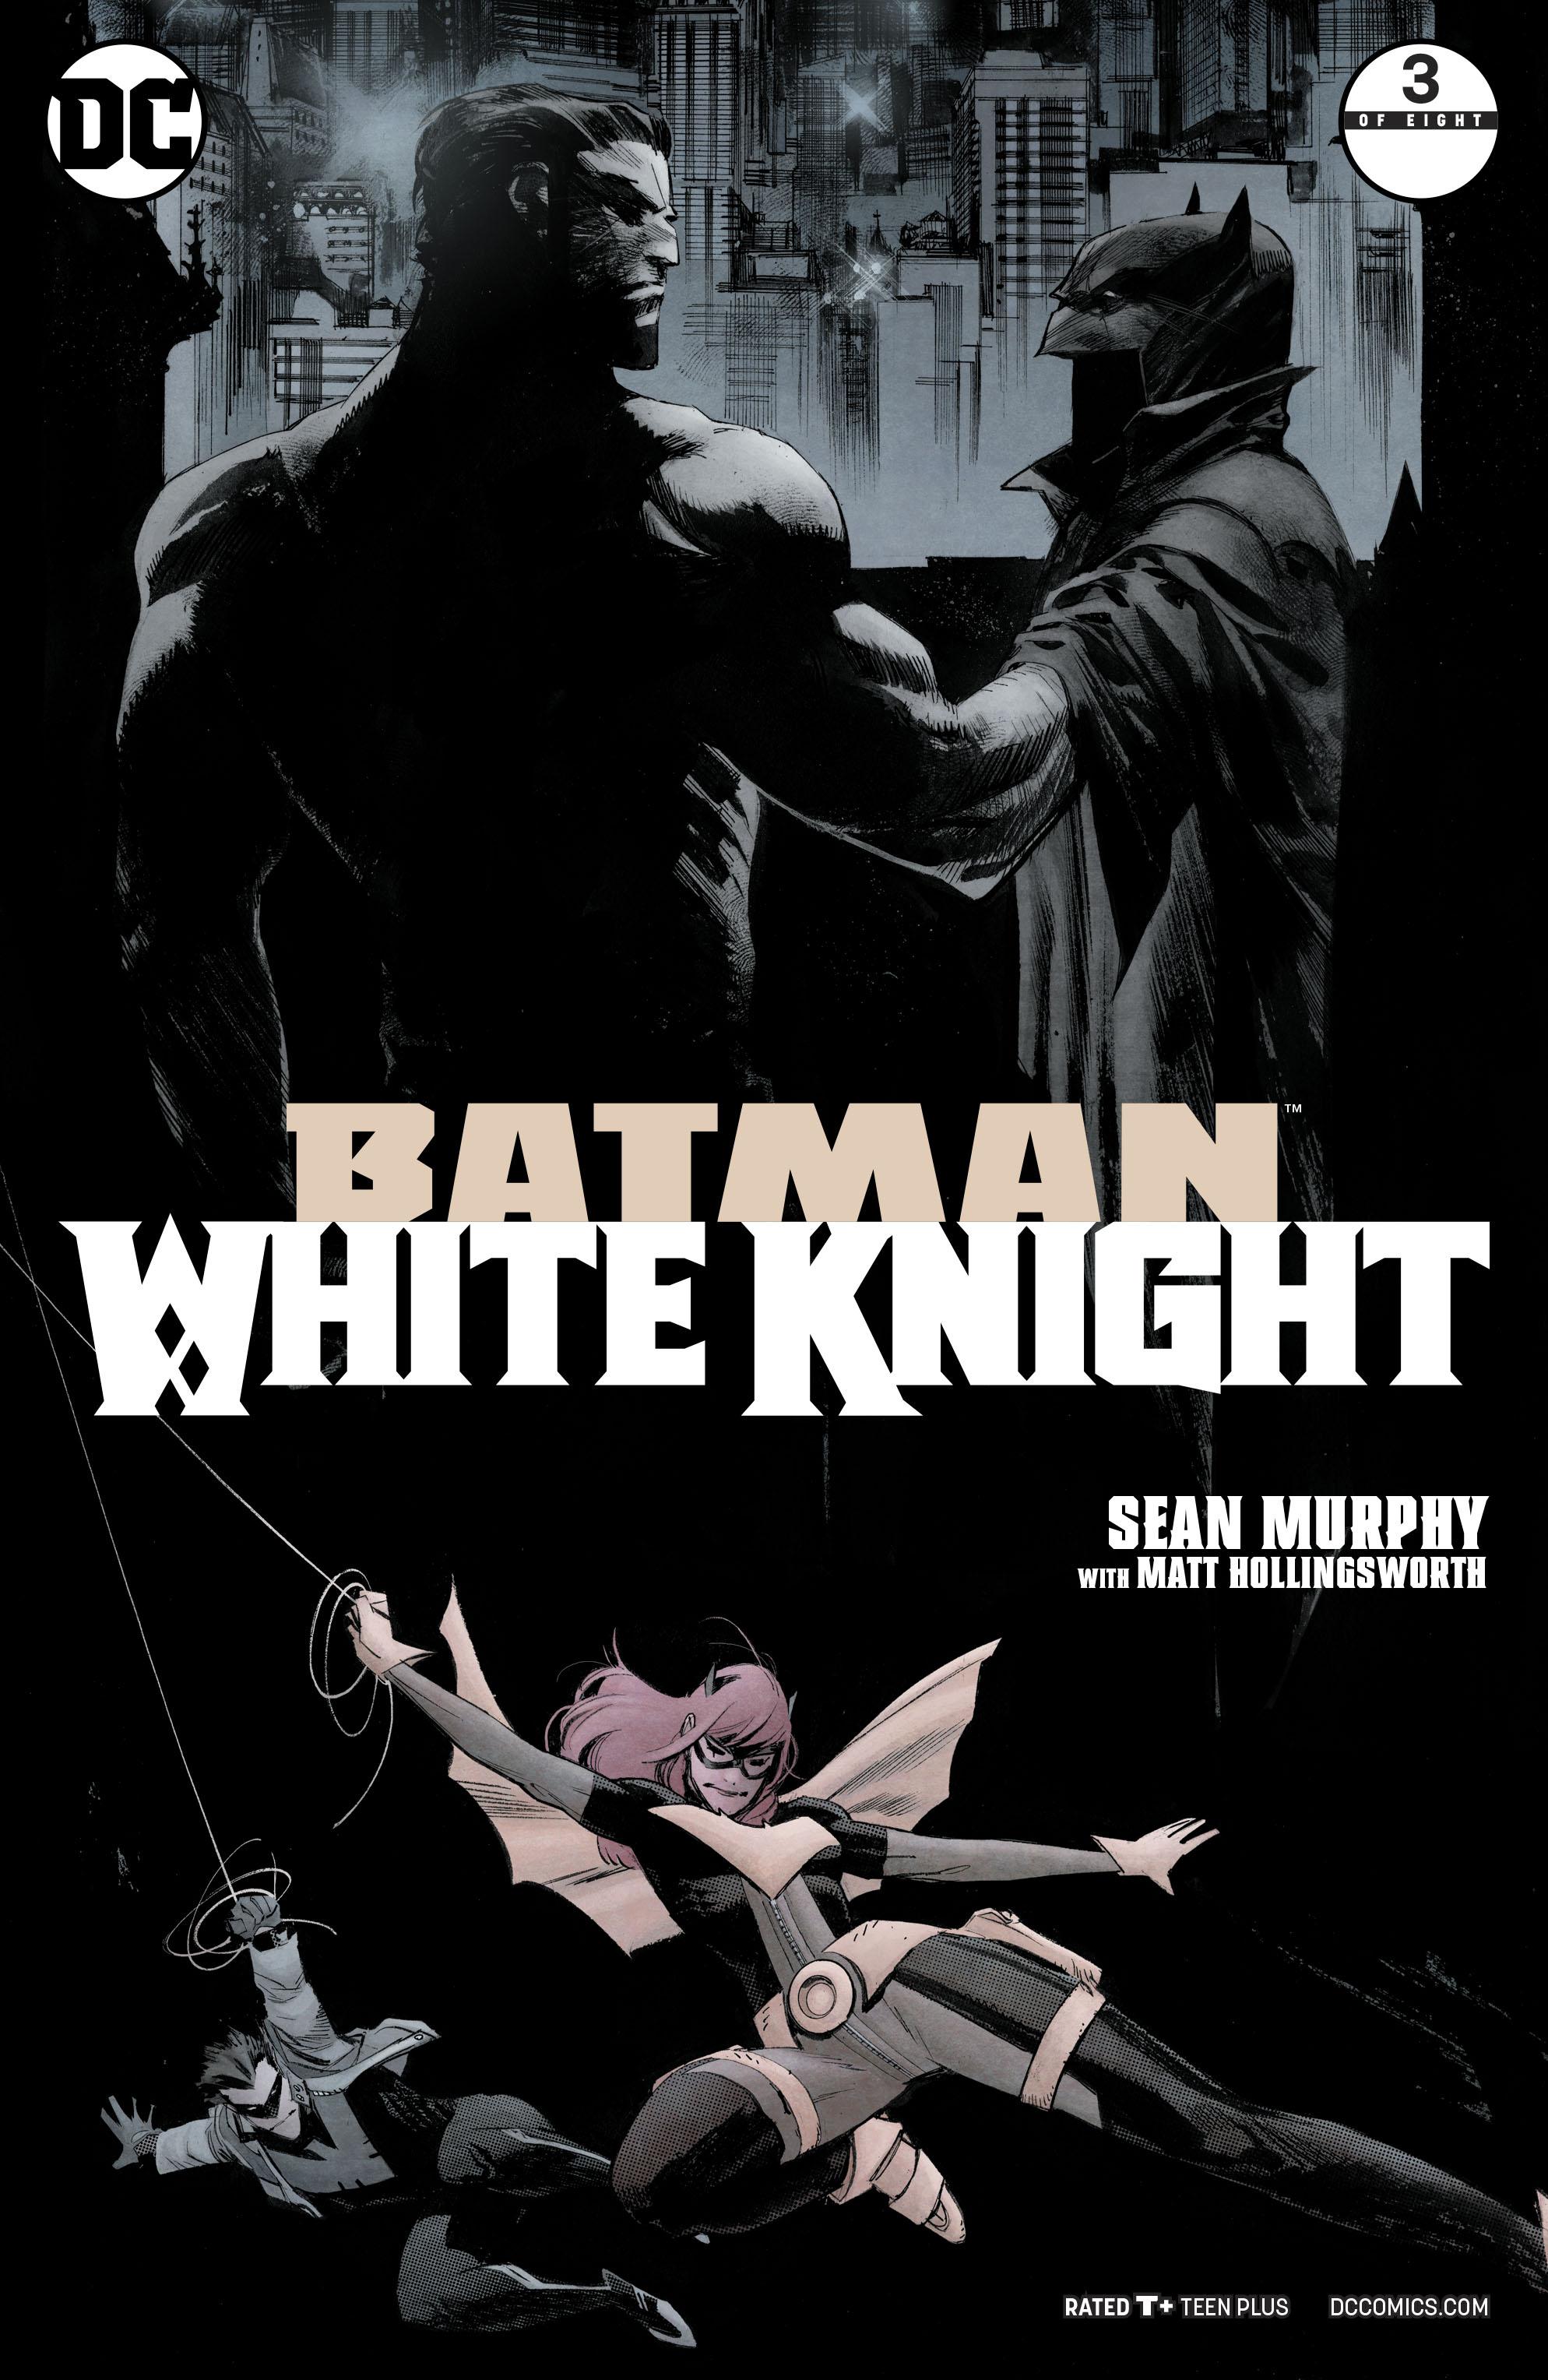 White Knight 3